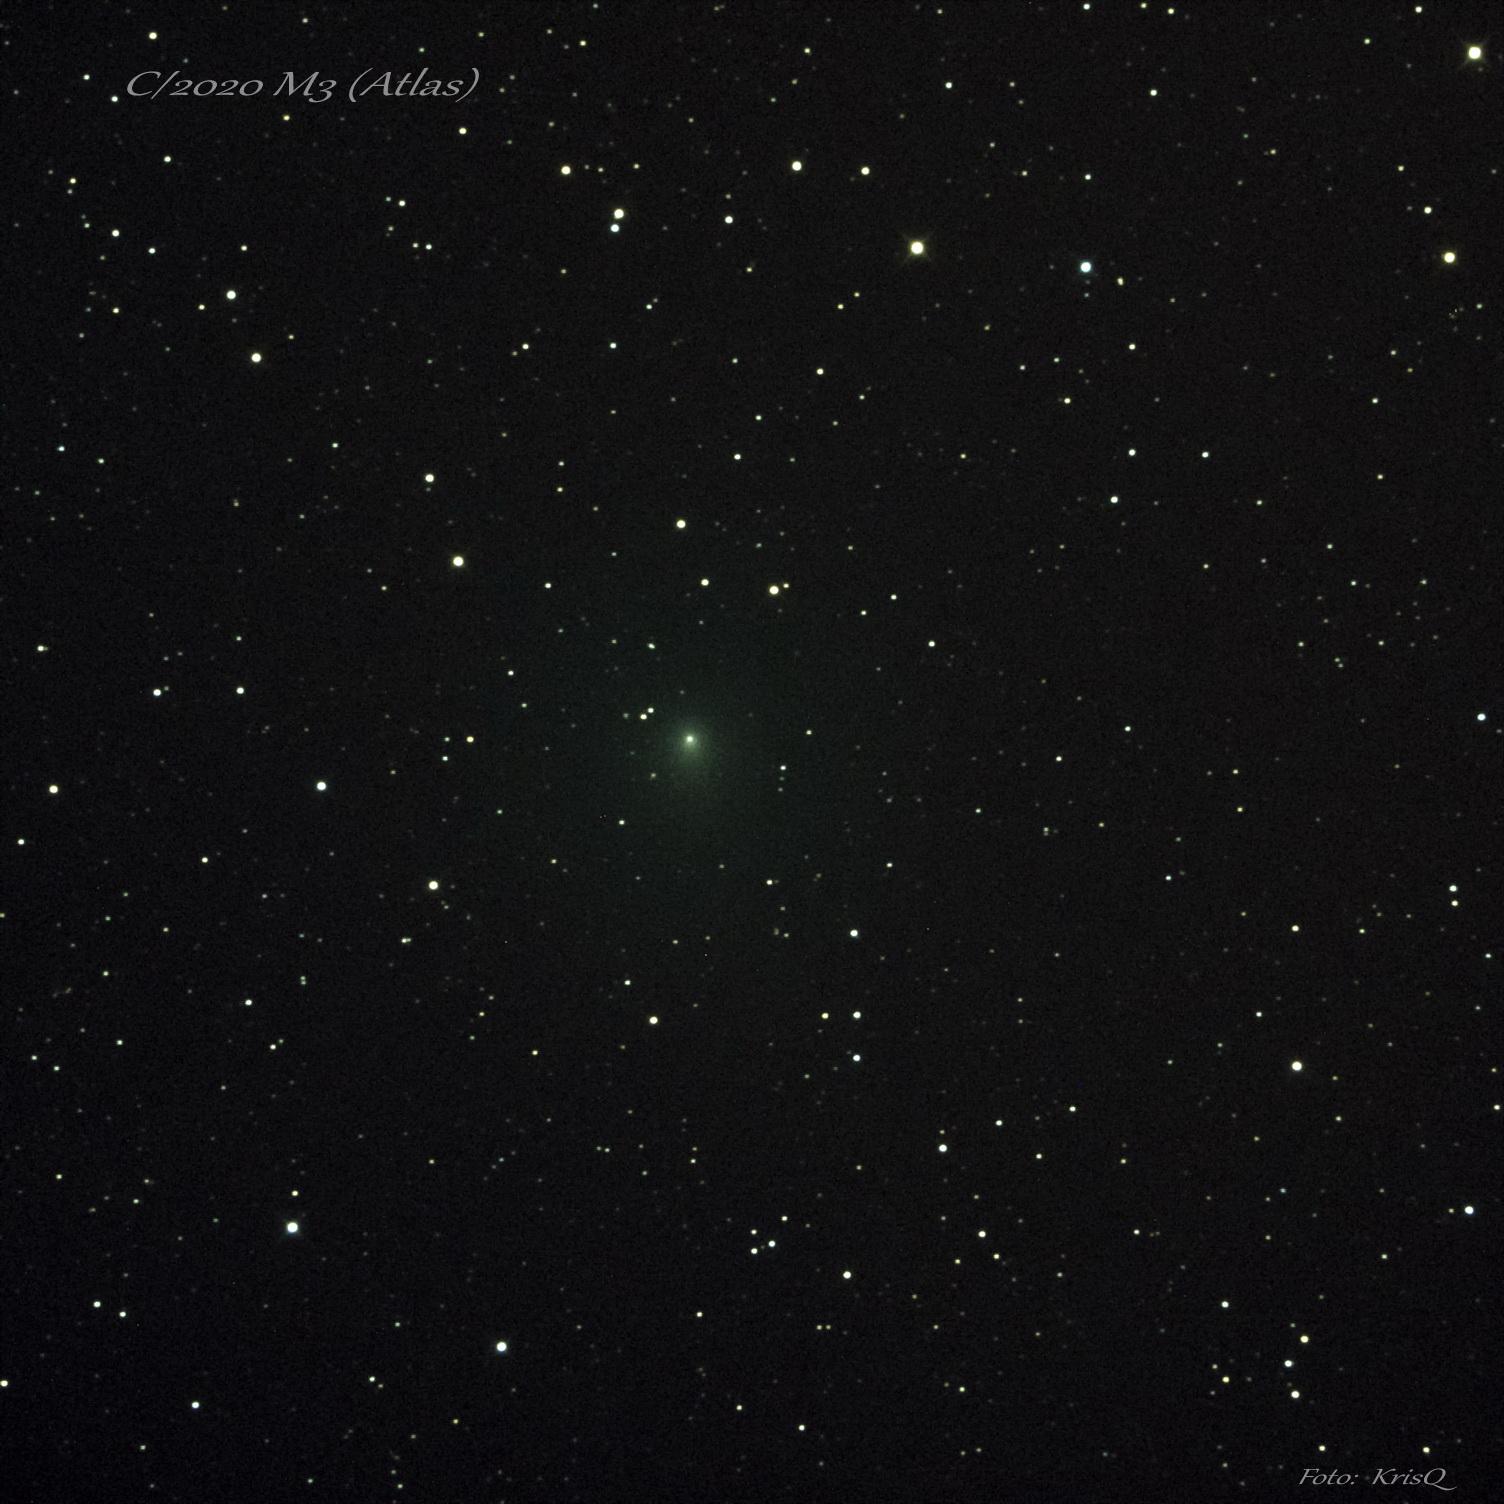 C-2020 M3 (ATLAS).jpg